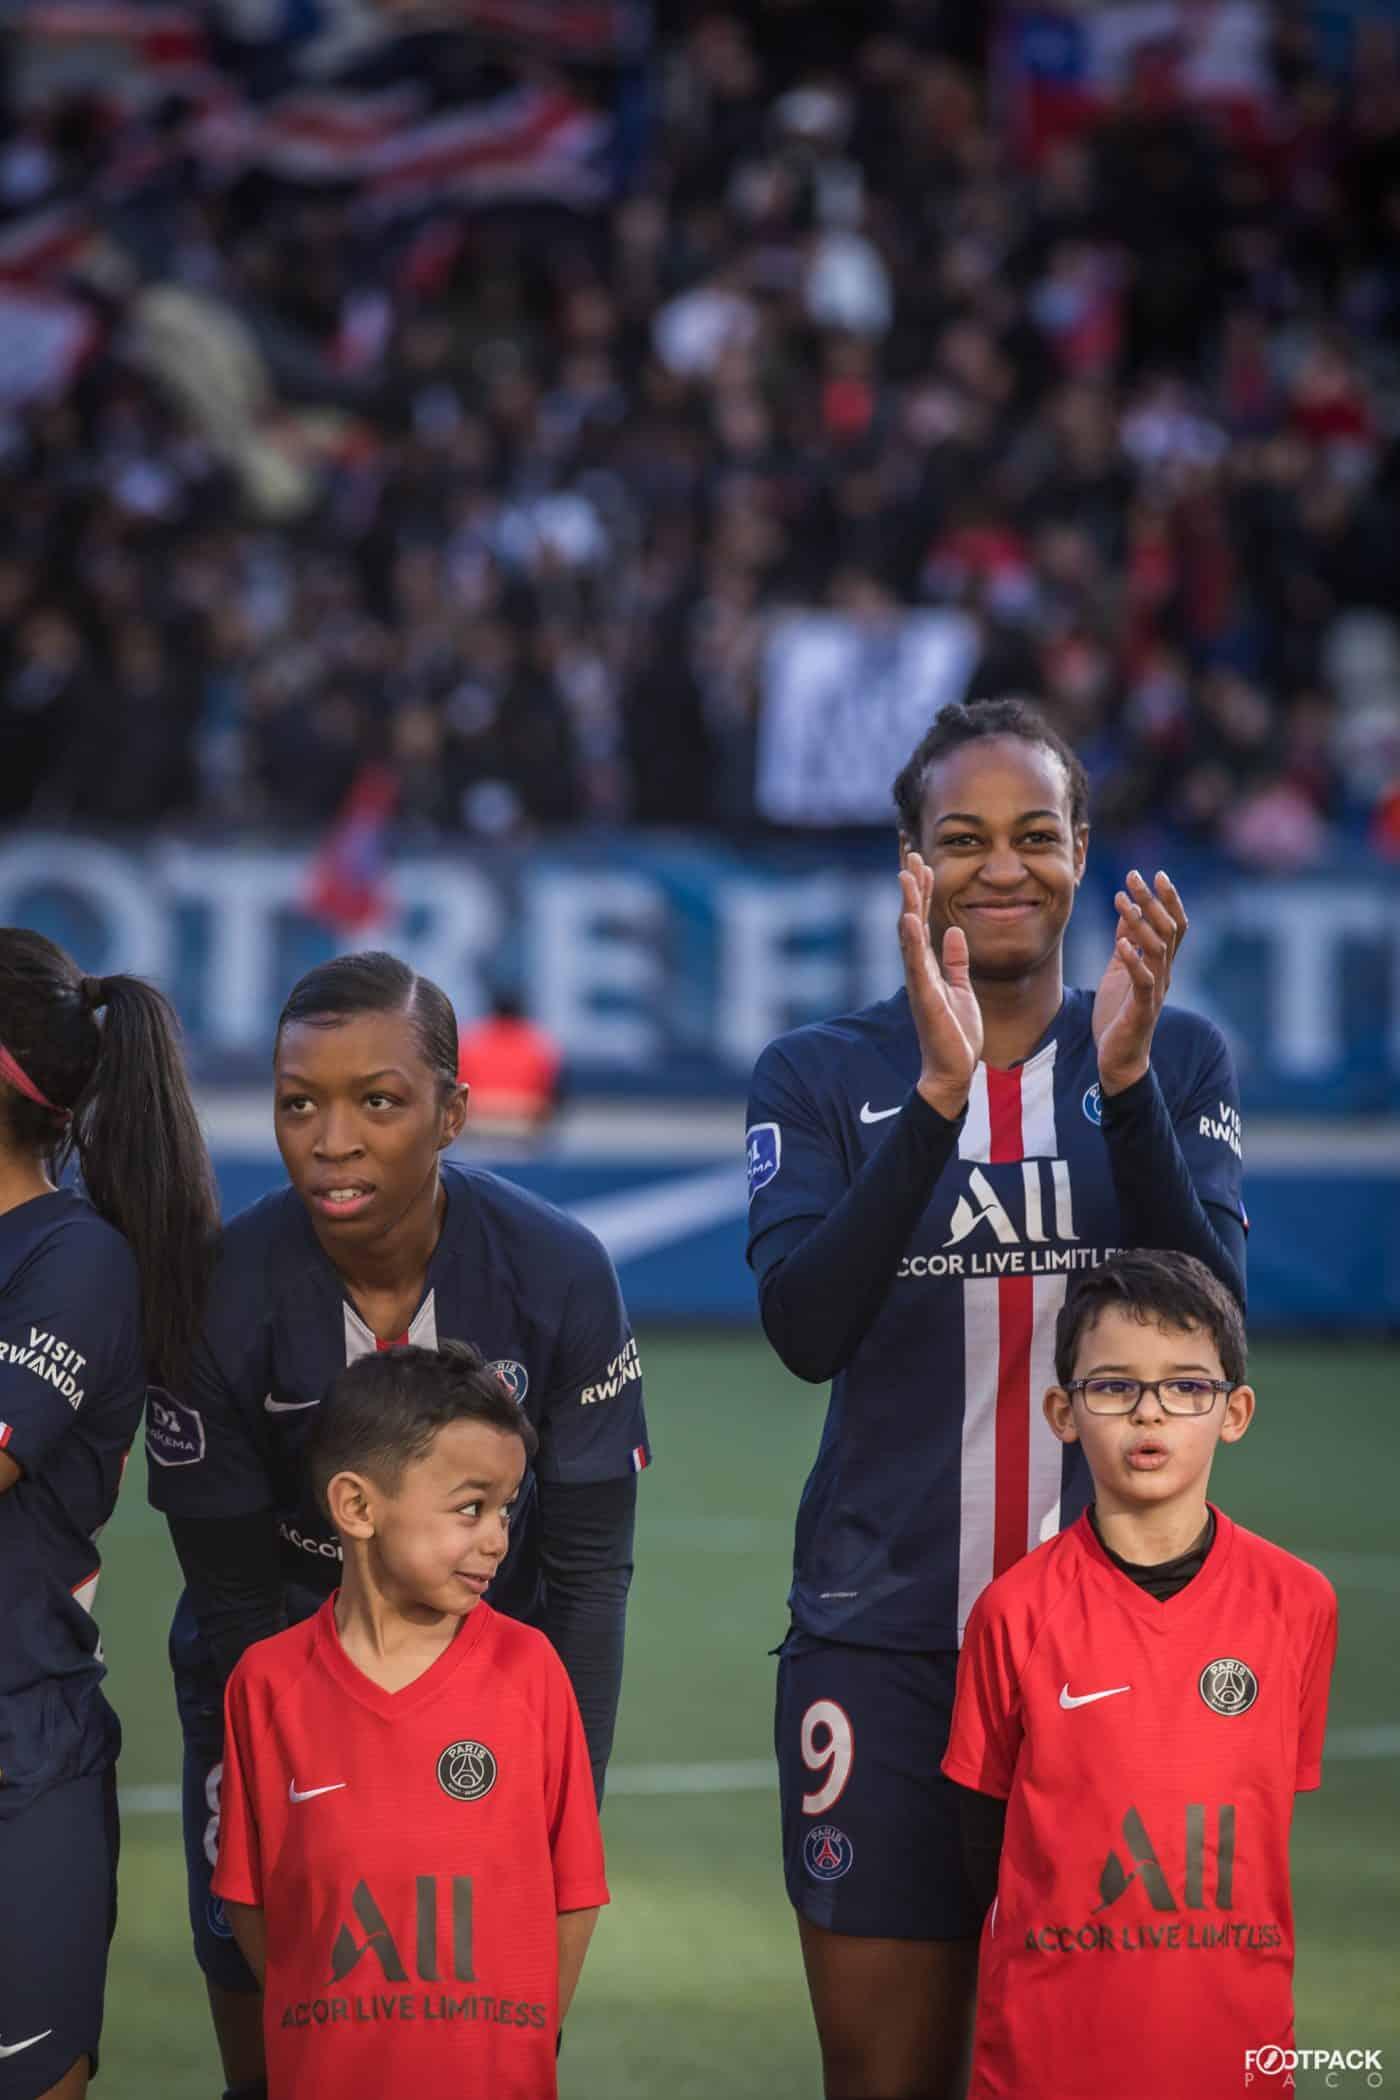 au-stade-paris-saint-germain-psg-olympique-de-marseille-d1-feminine-arkema-footpack-6